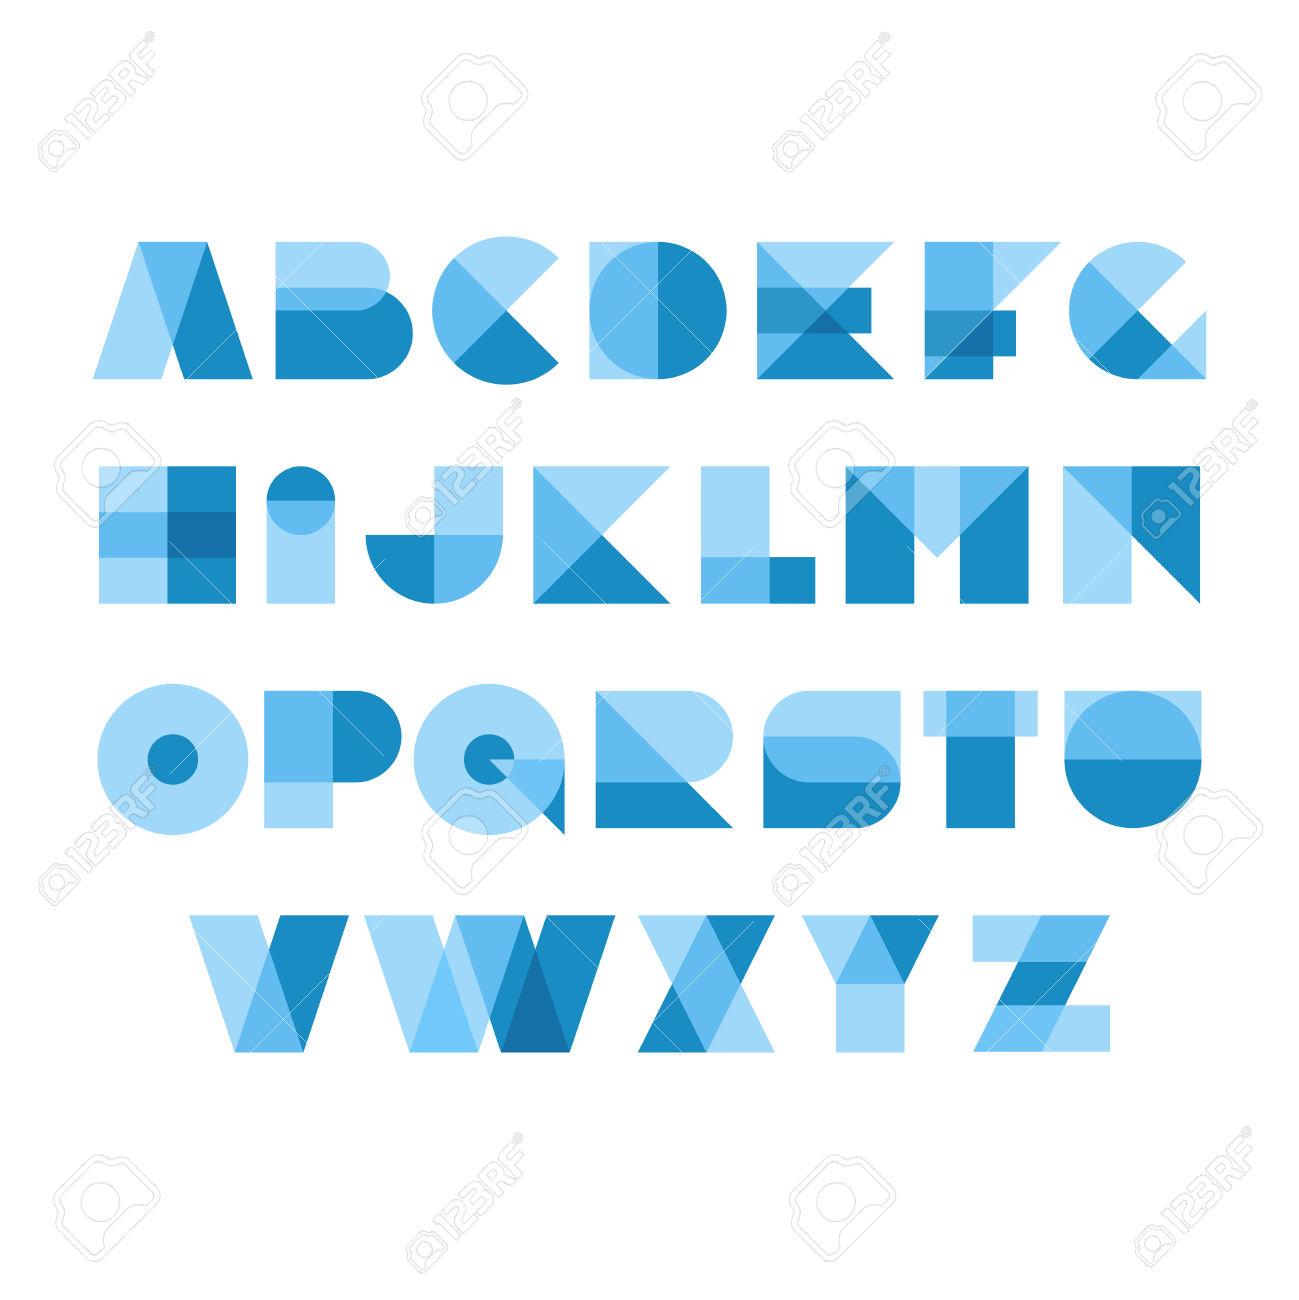 Geometric Shapes Font Alphabet. Overlay Transparent Style Letters.